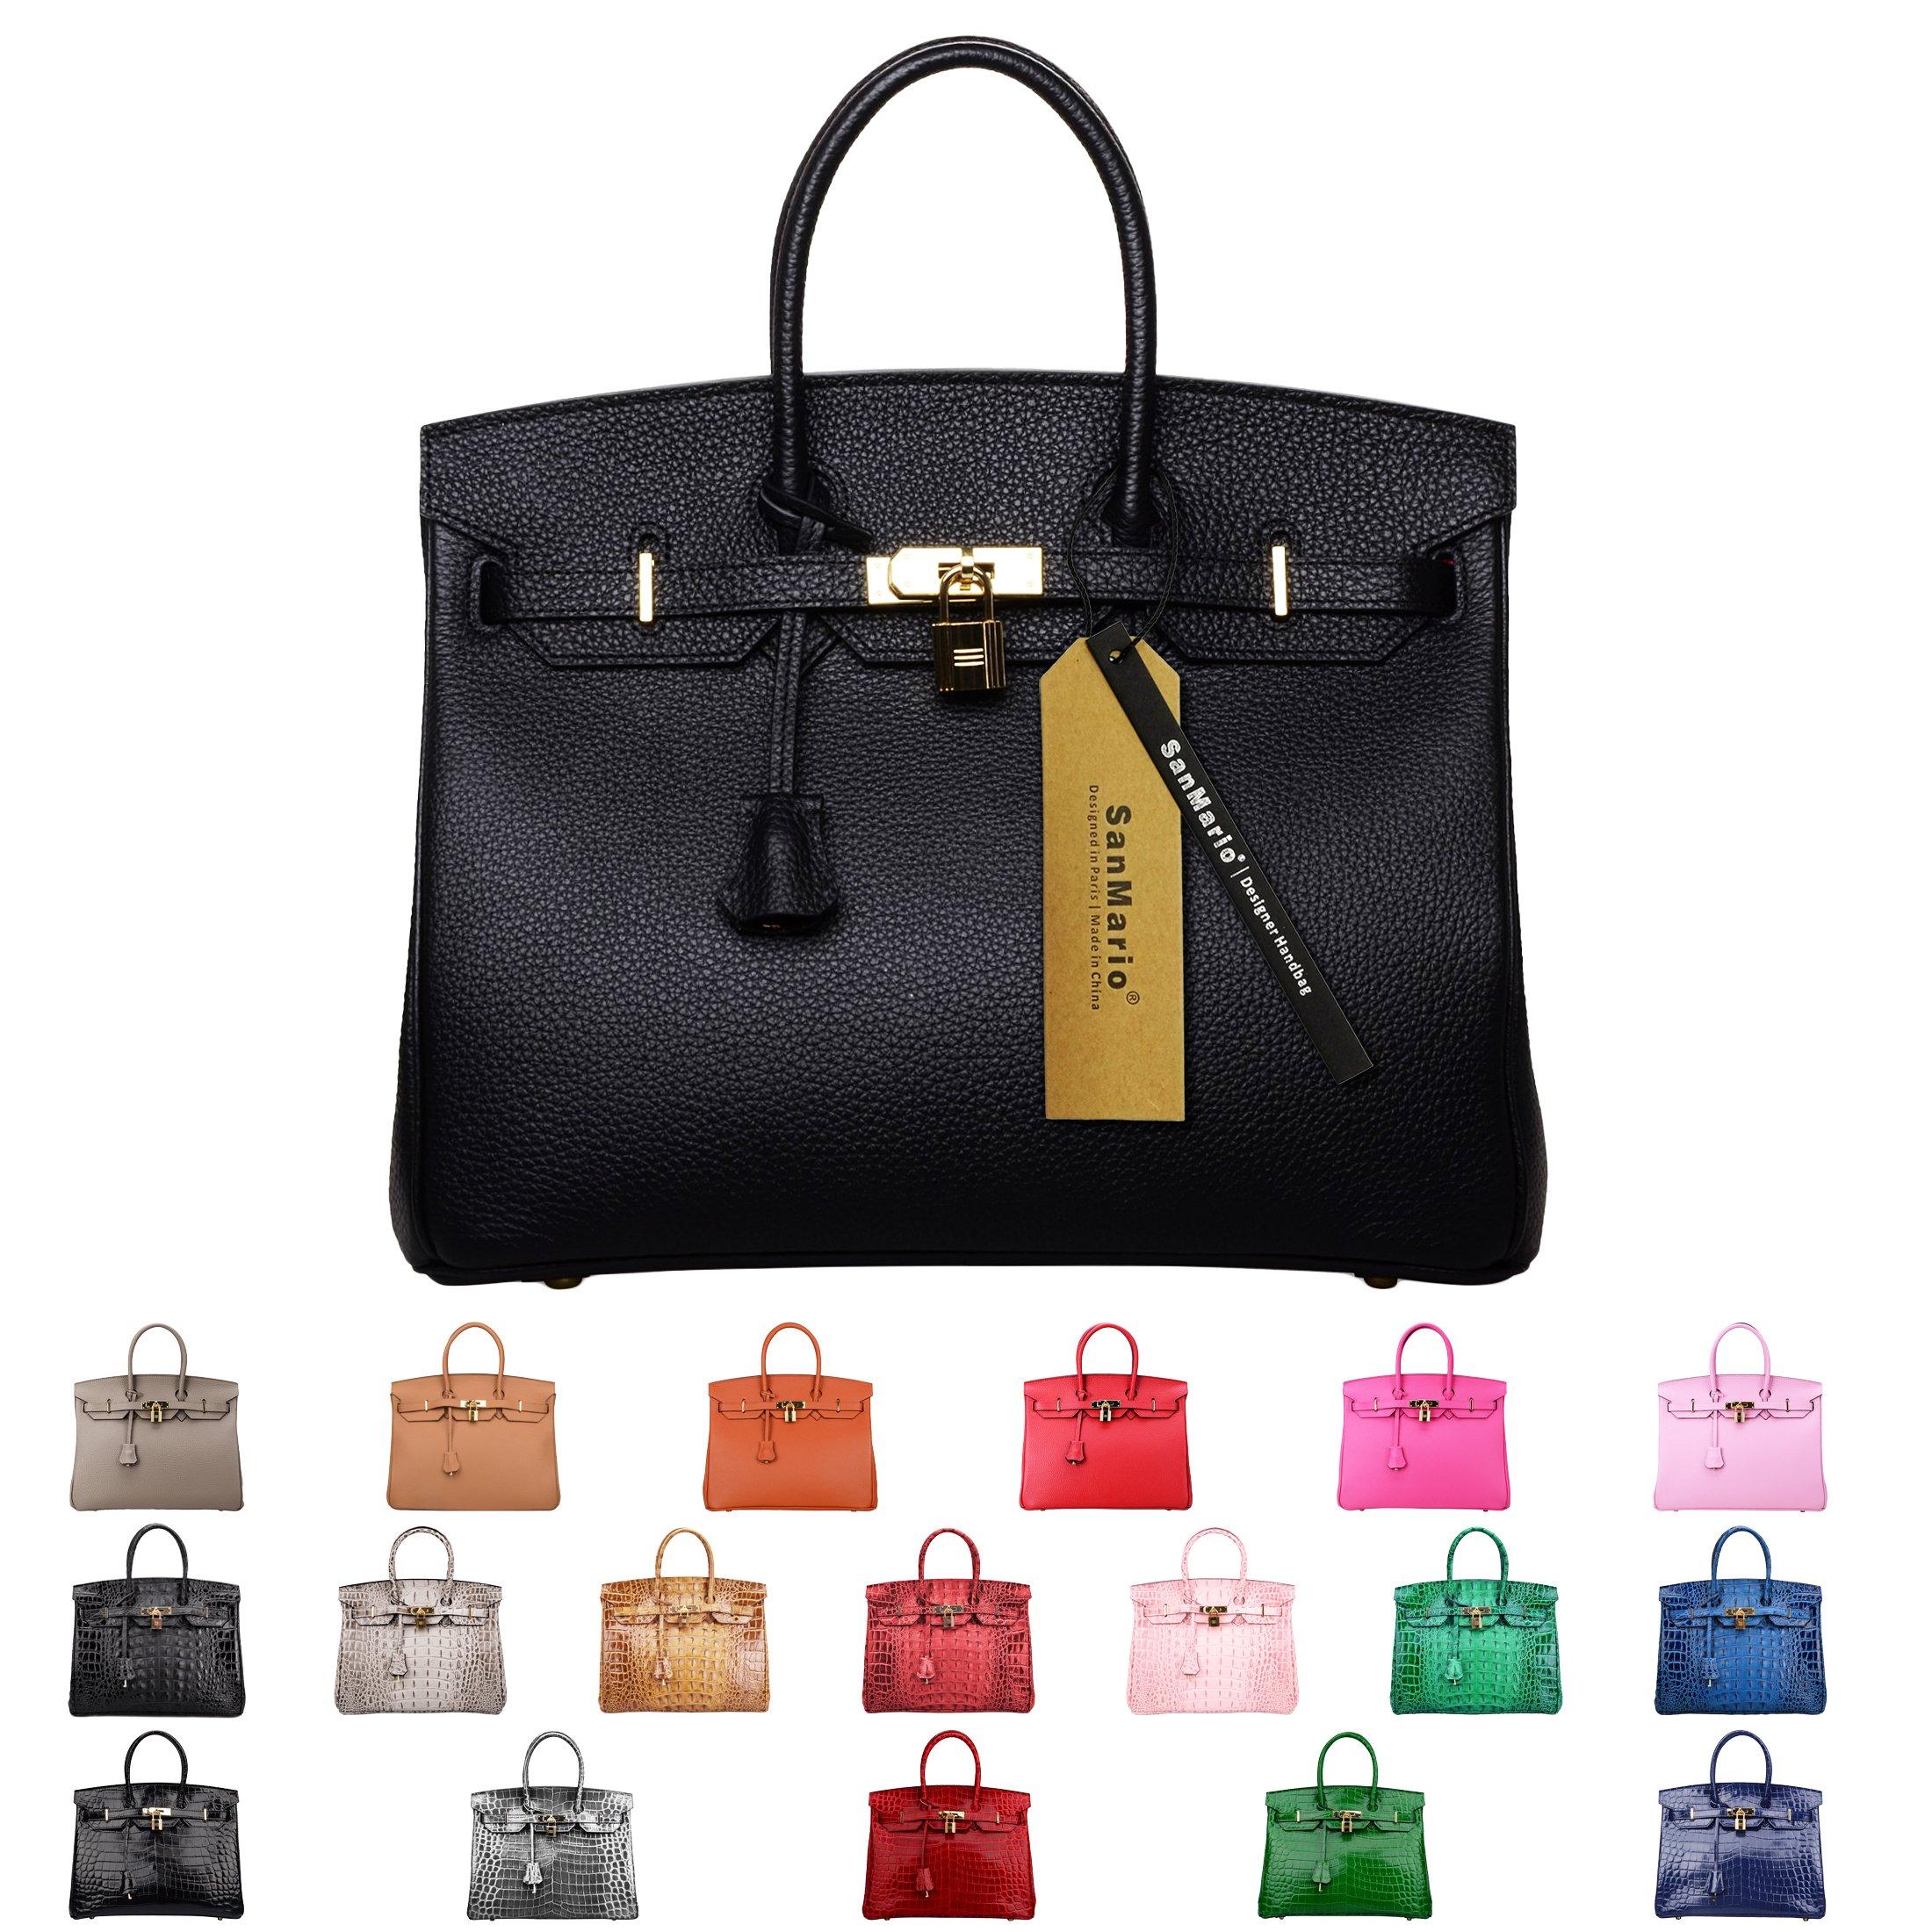 SanMario Designer Handbag Top Handle Padlock Women's Leather Bag with Golden Hardware Black 35cm/14'' by SanMario